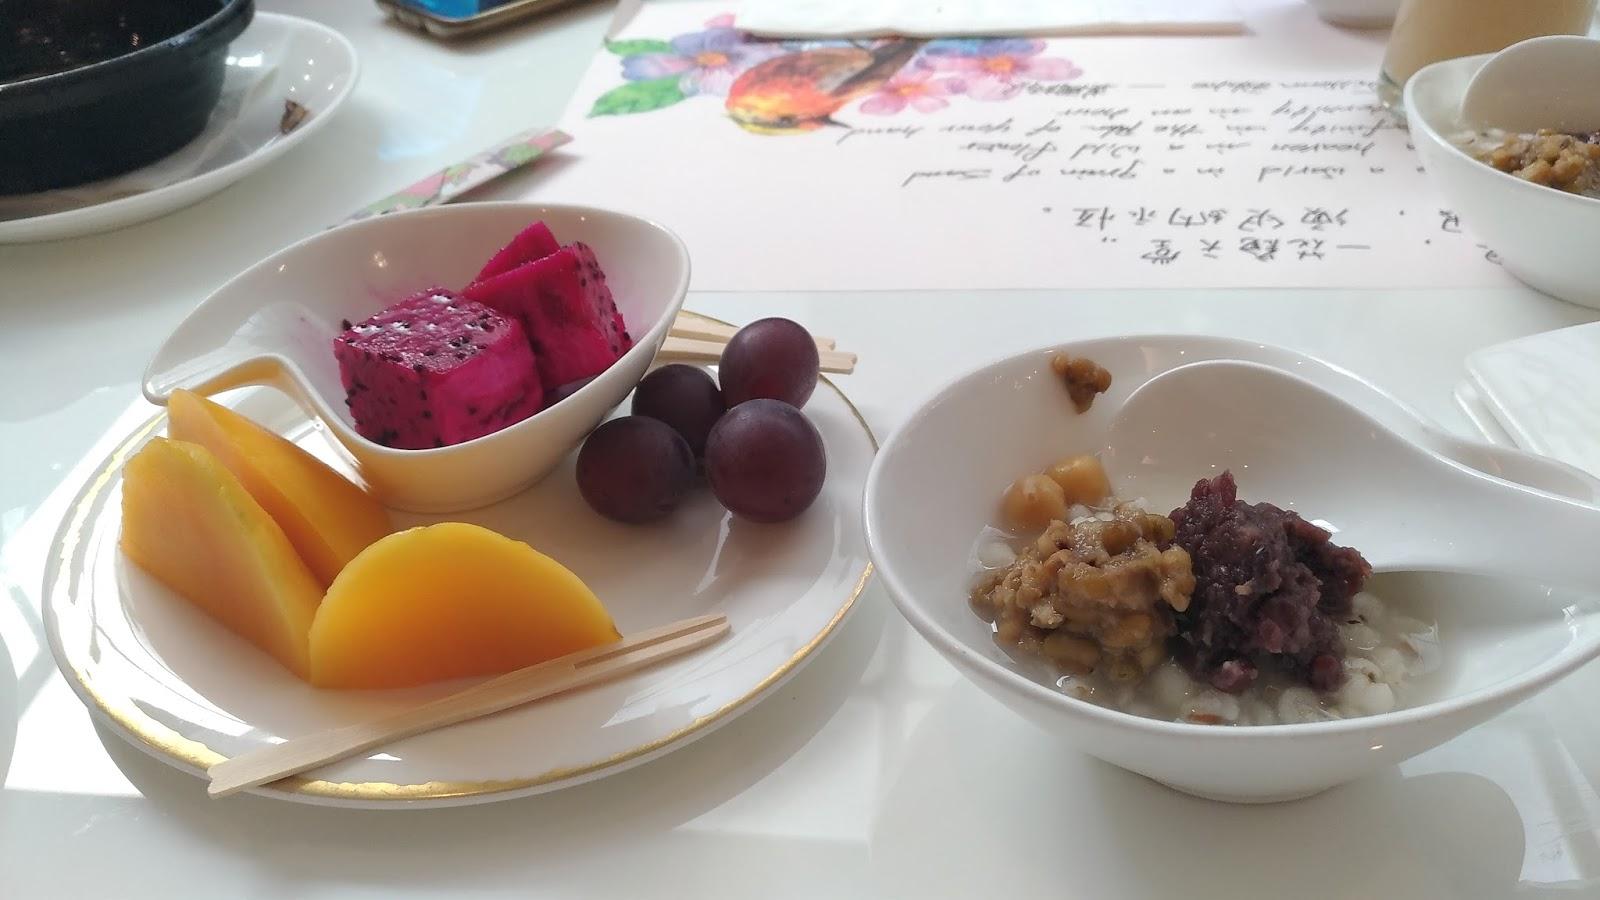 P 20170712 140925 vHDR Auto - 【嘉義美食】皇爵大飯店-優雅平價的豪華套餐,就在火車站旁!